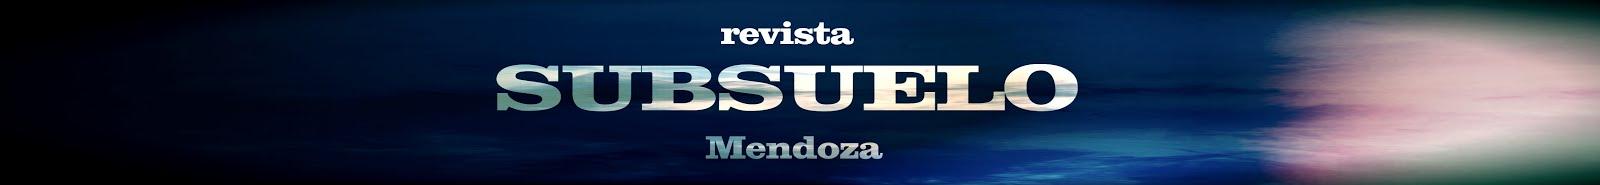 Revista Subsuelo